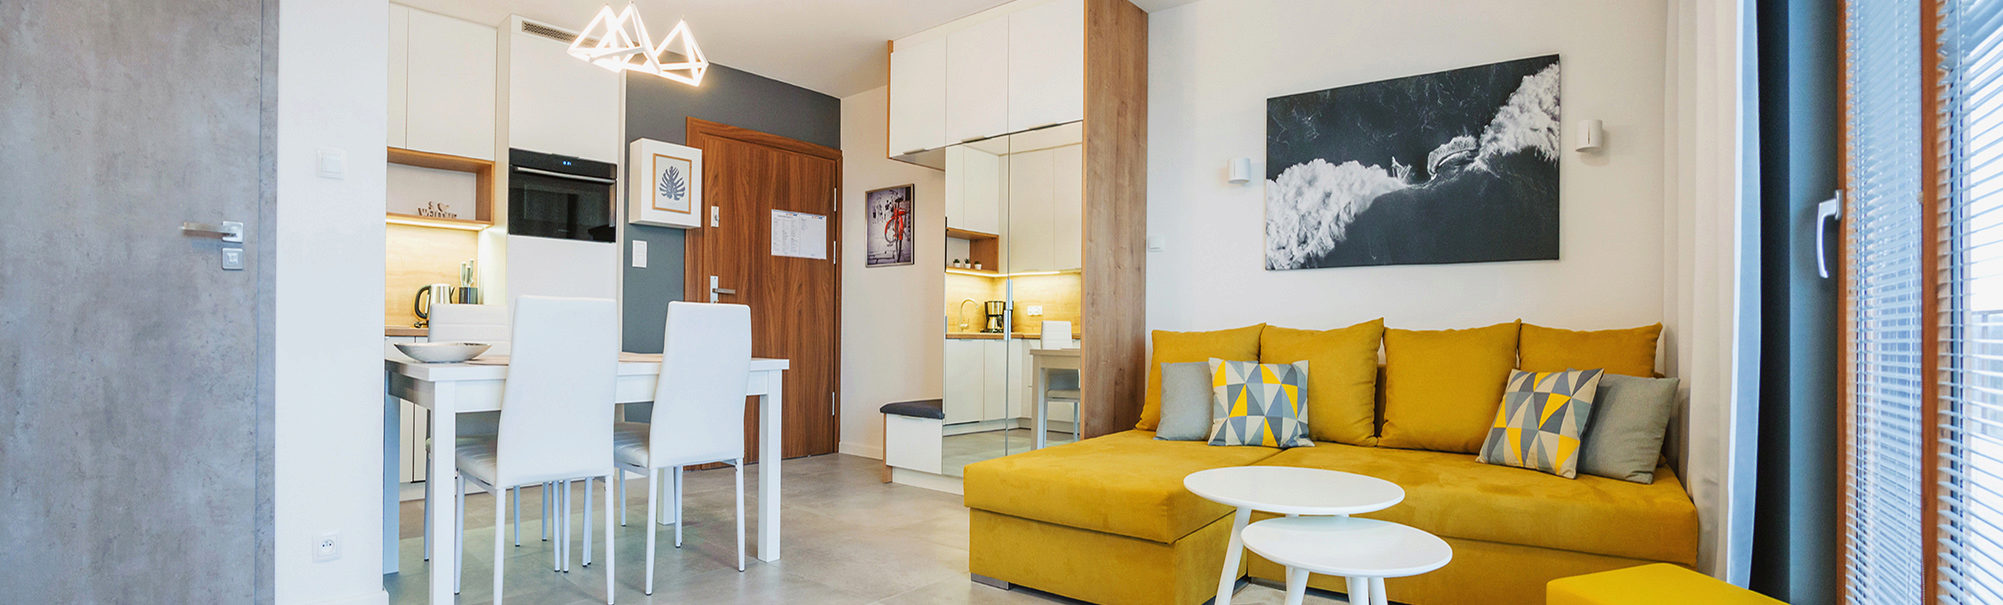 Apartamenty Sun&Snow Apartament A 40 delux Kołobrzeg - Resort